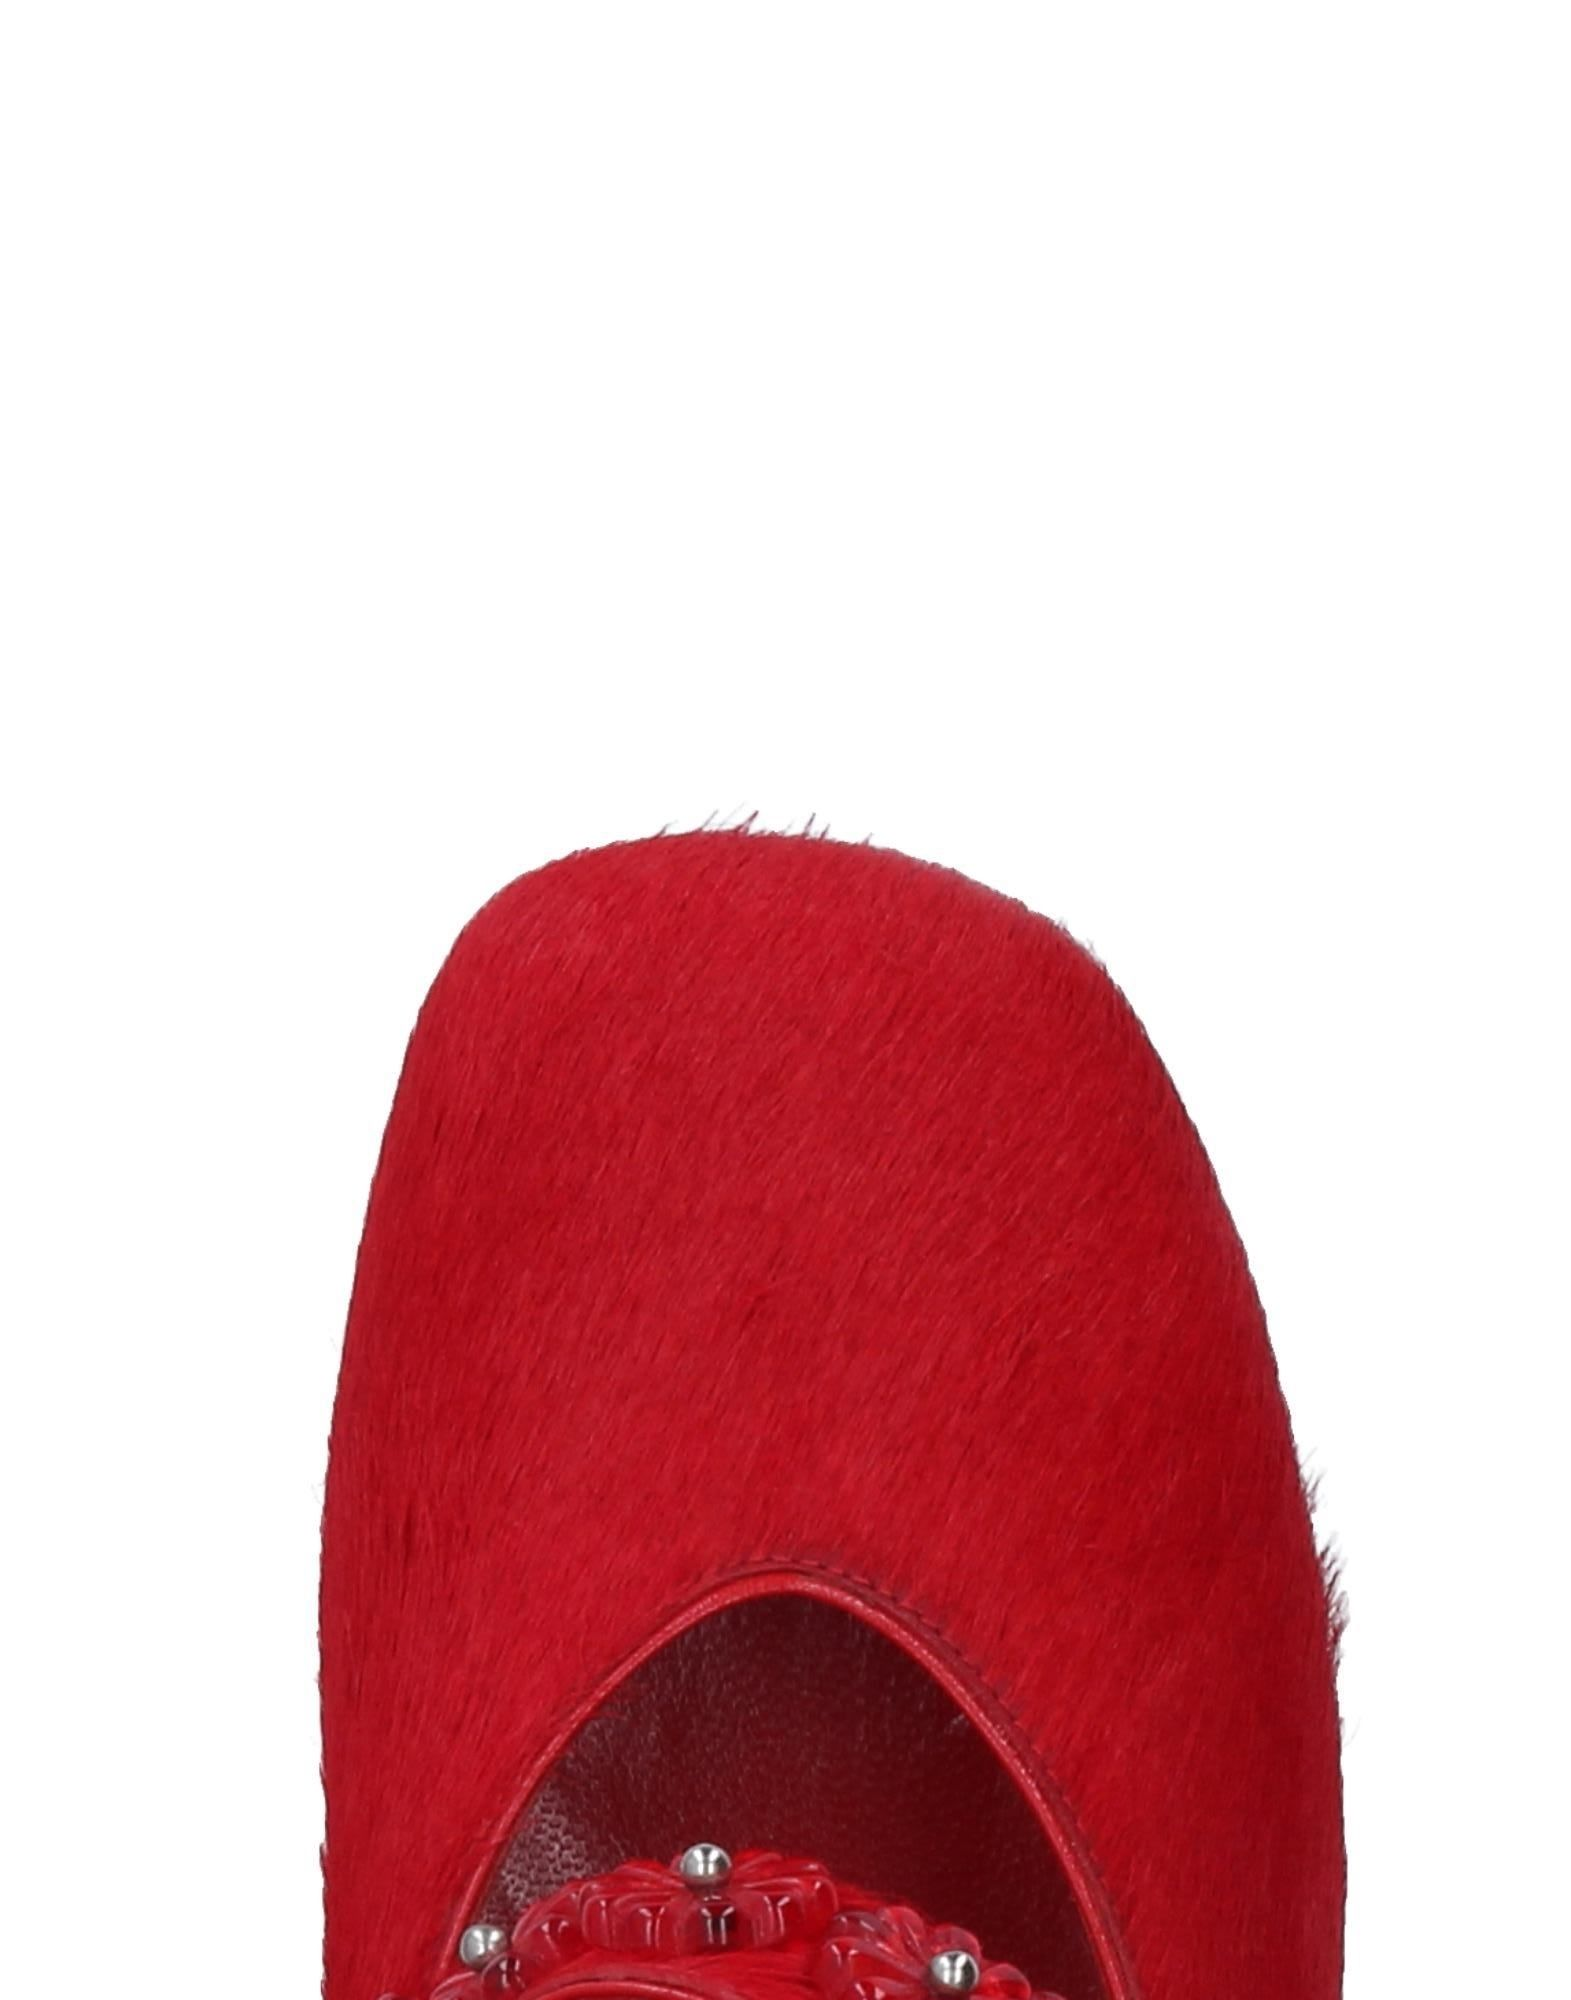 Simone Rocha Pumps Schuhe Damen  11280699BU Beliebte Schuhe Pumps 4f35dc